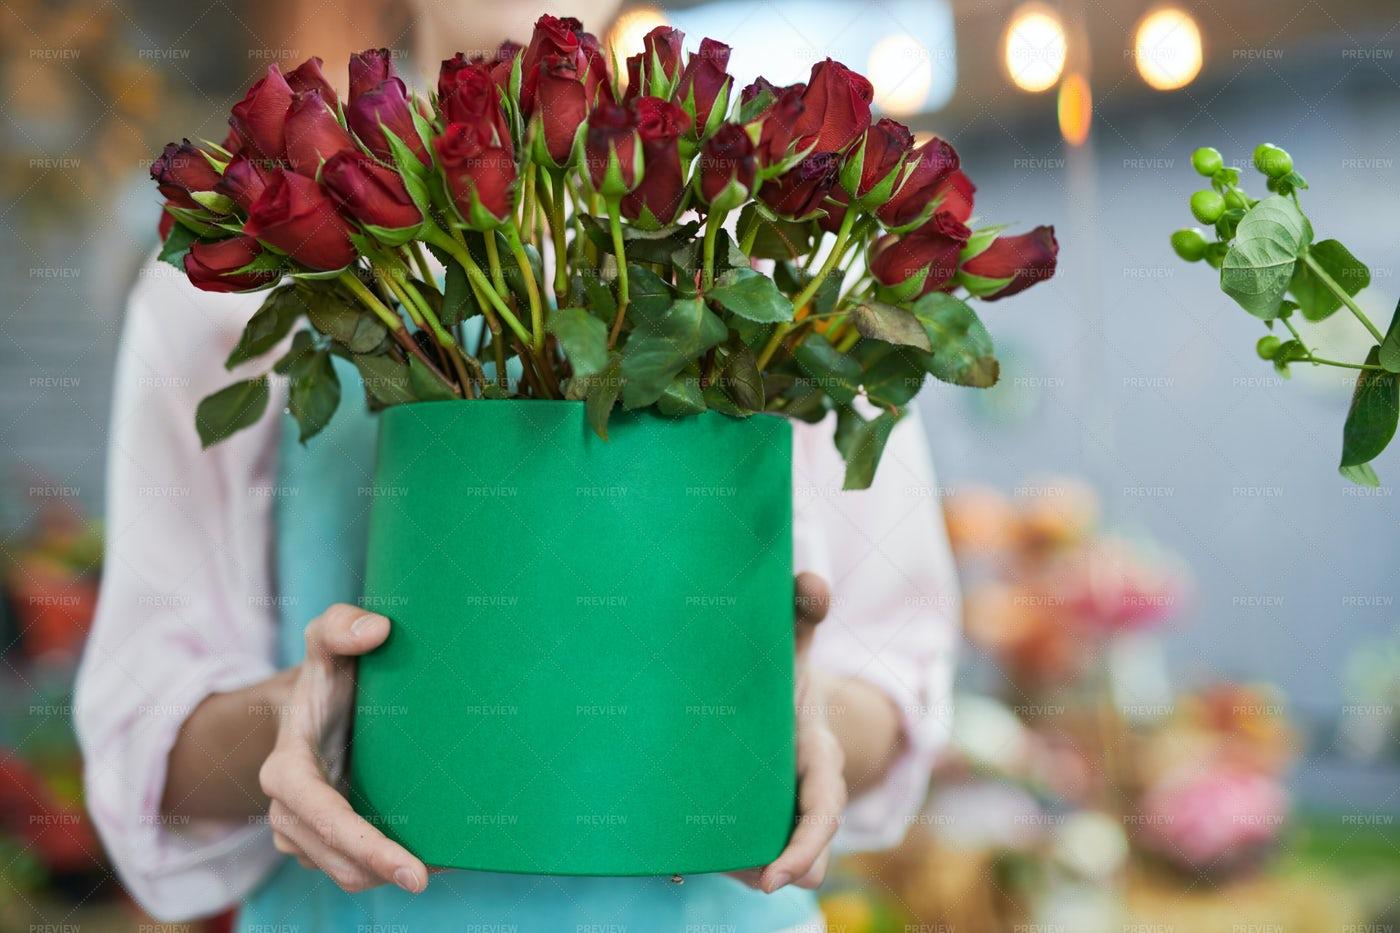 Florist Holding Roses: Stock Photos